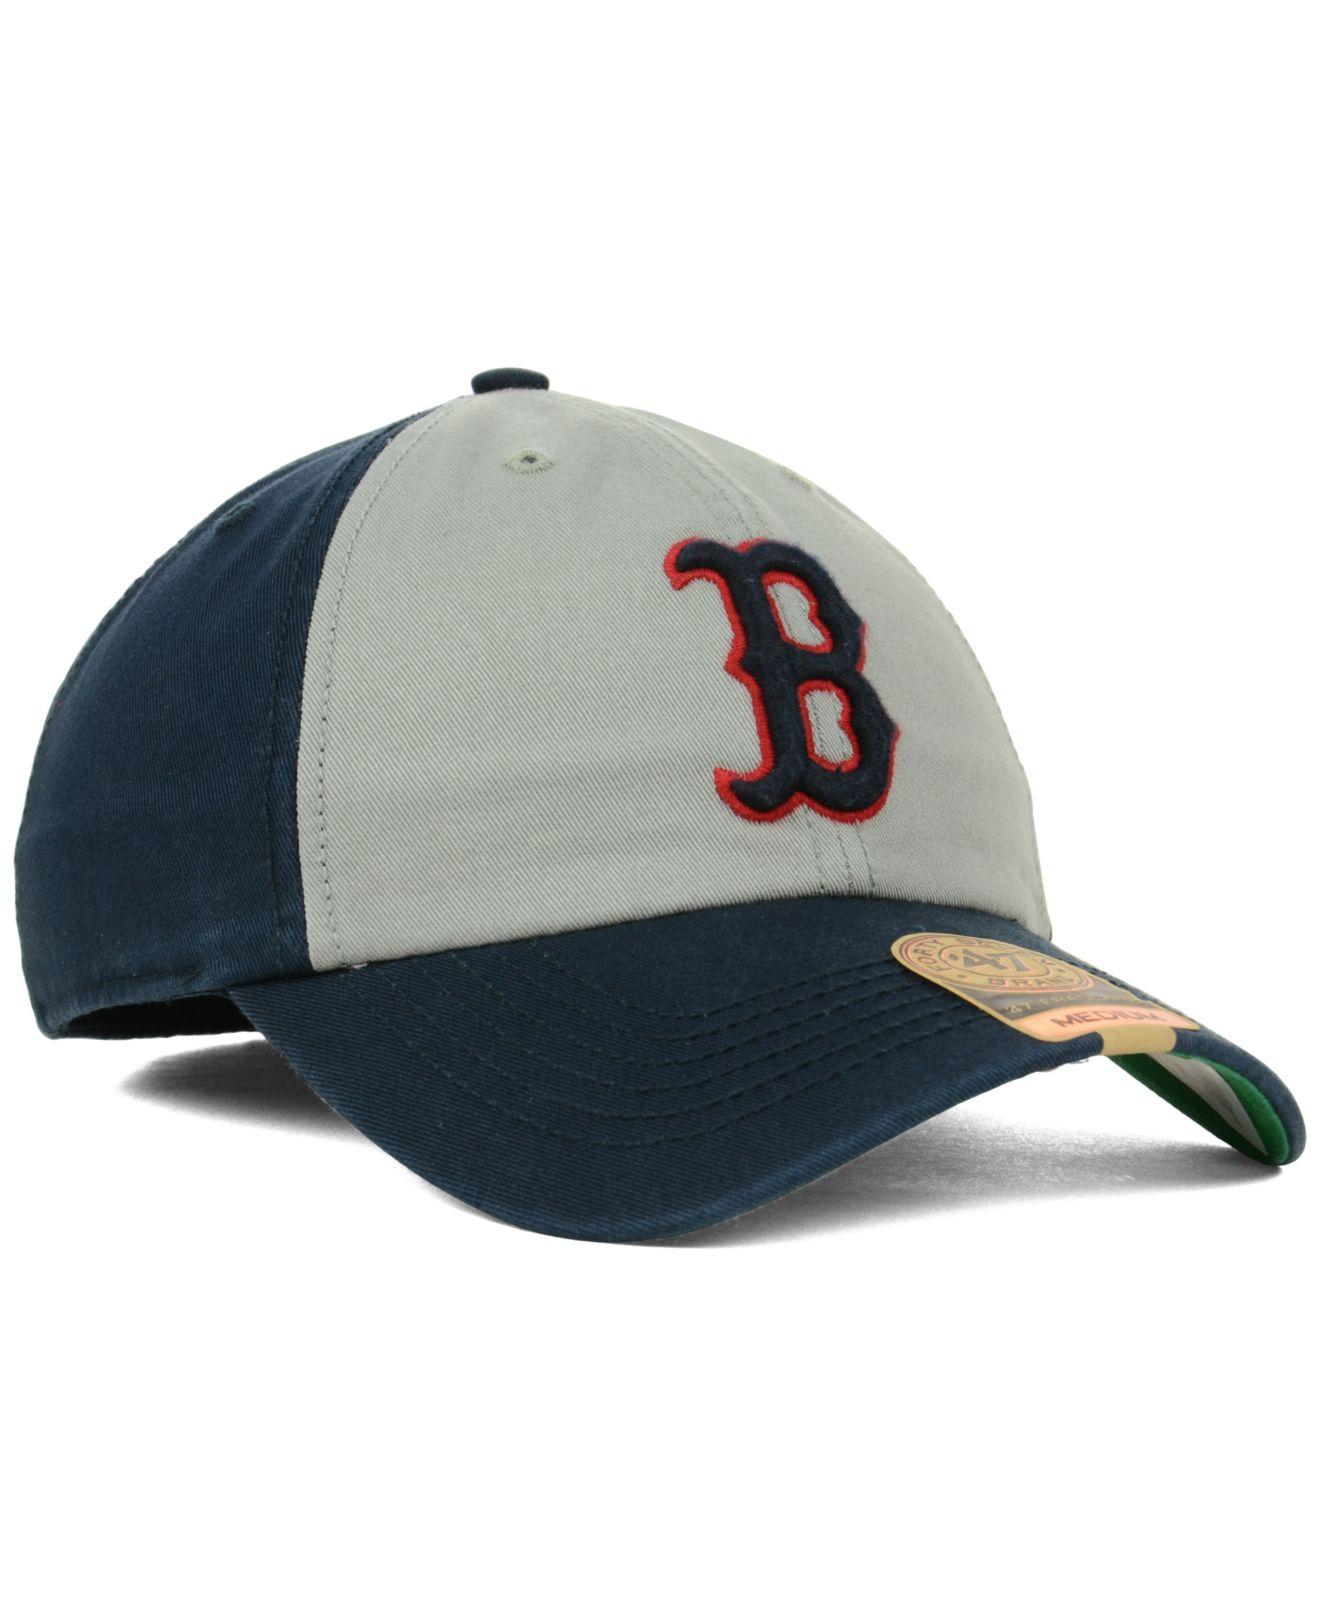 ef5770d6 47 Brand Boston Red Sox Vip Franchise Cap in Gray for Men - Lyst